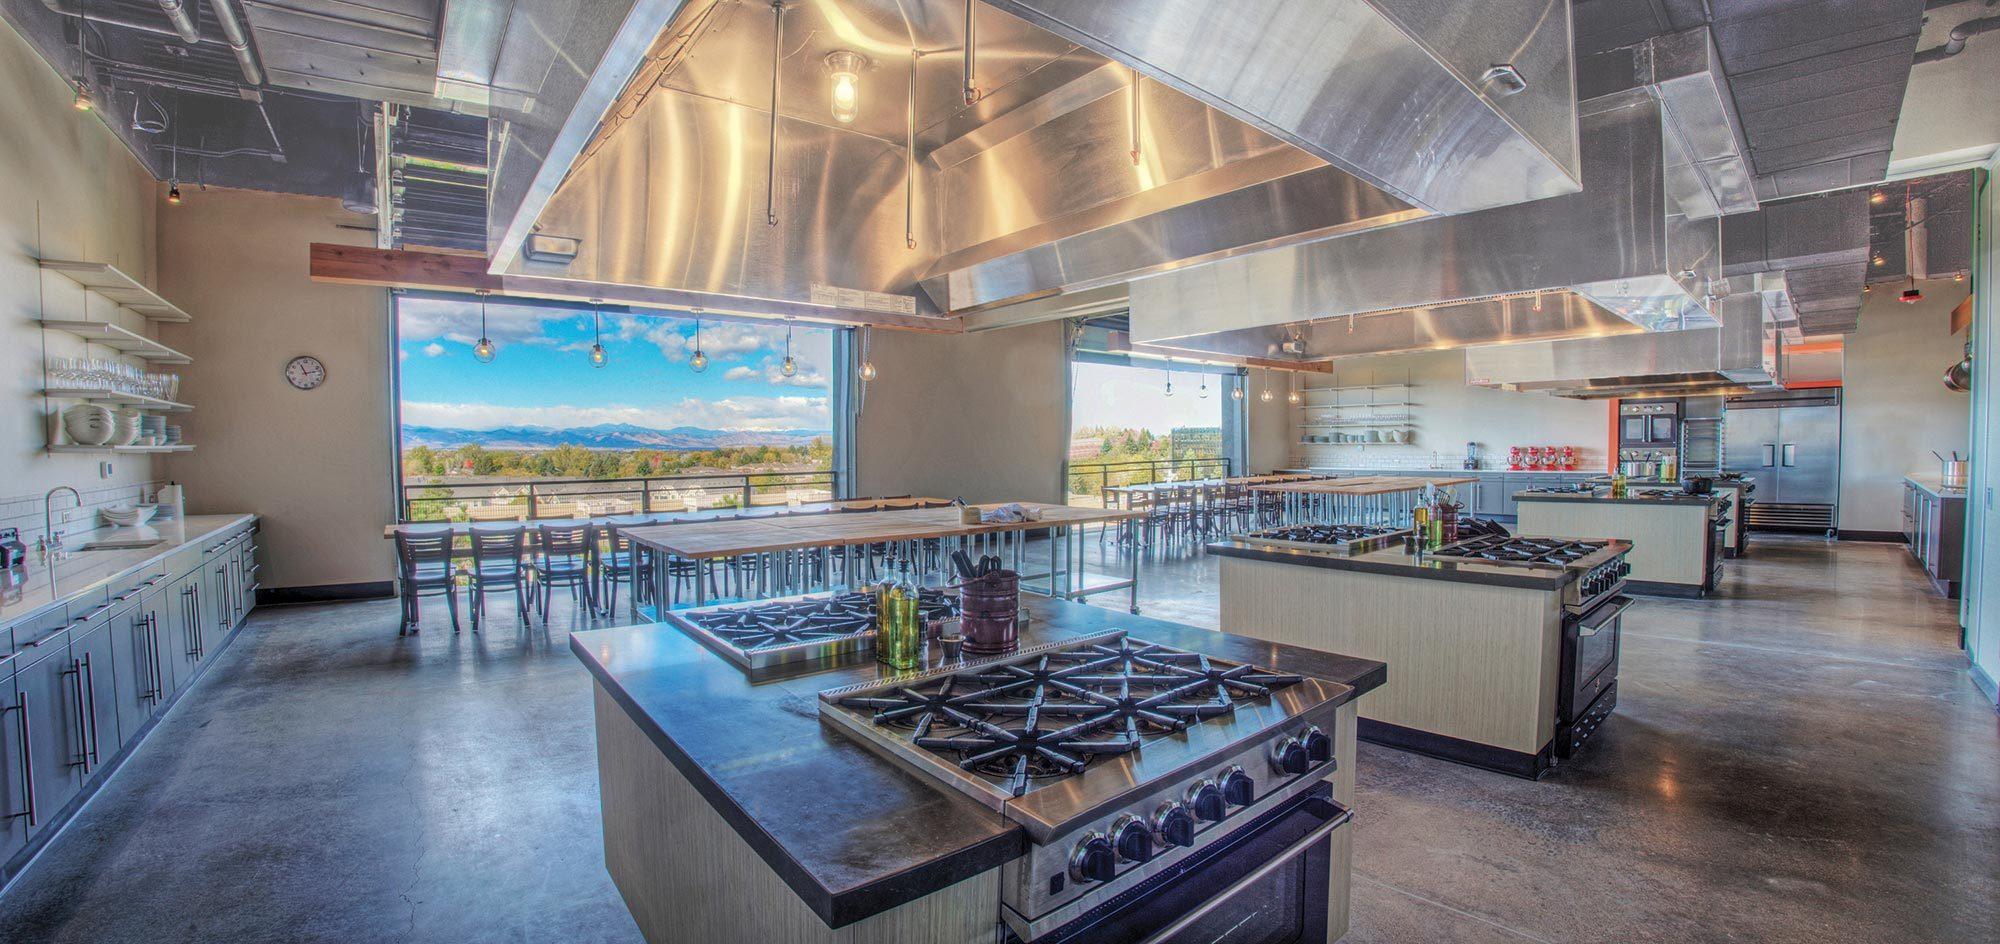 Uncorked Kitchen & Specialty Appliance